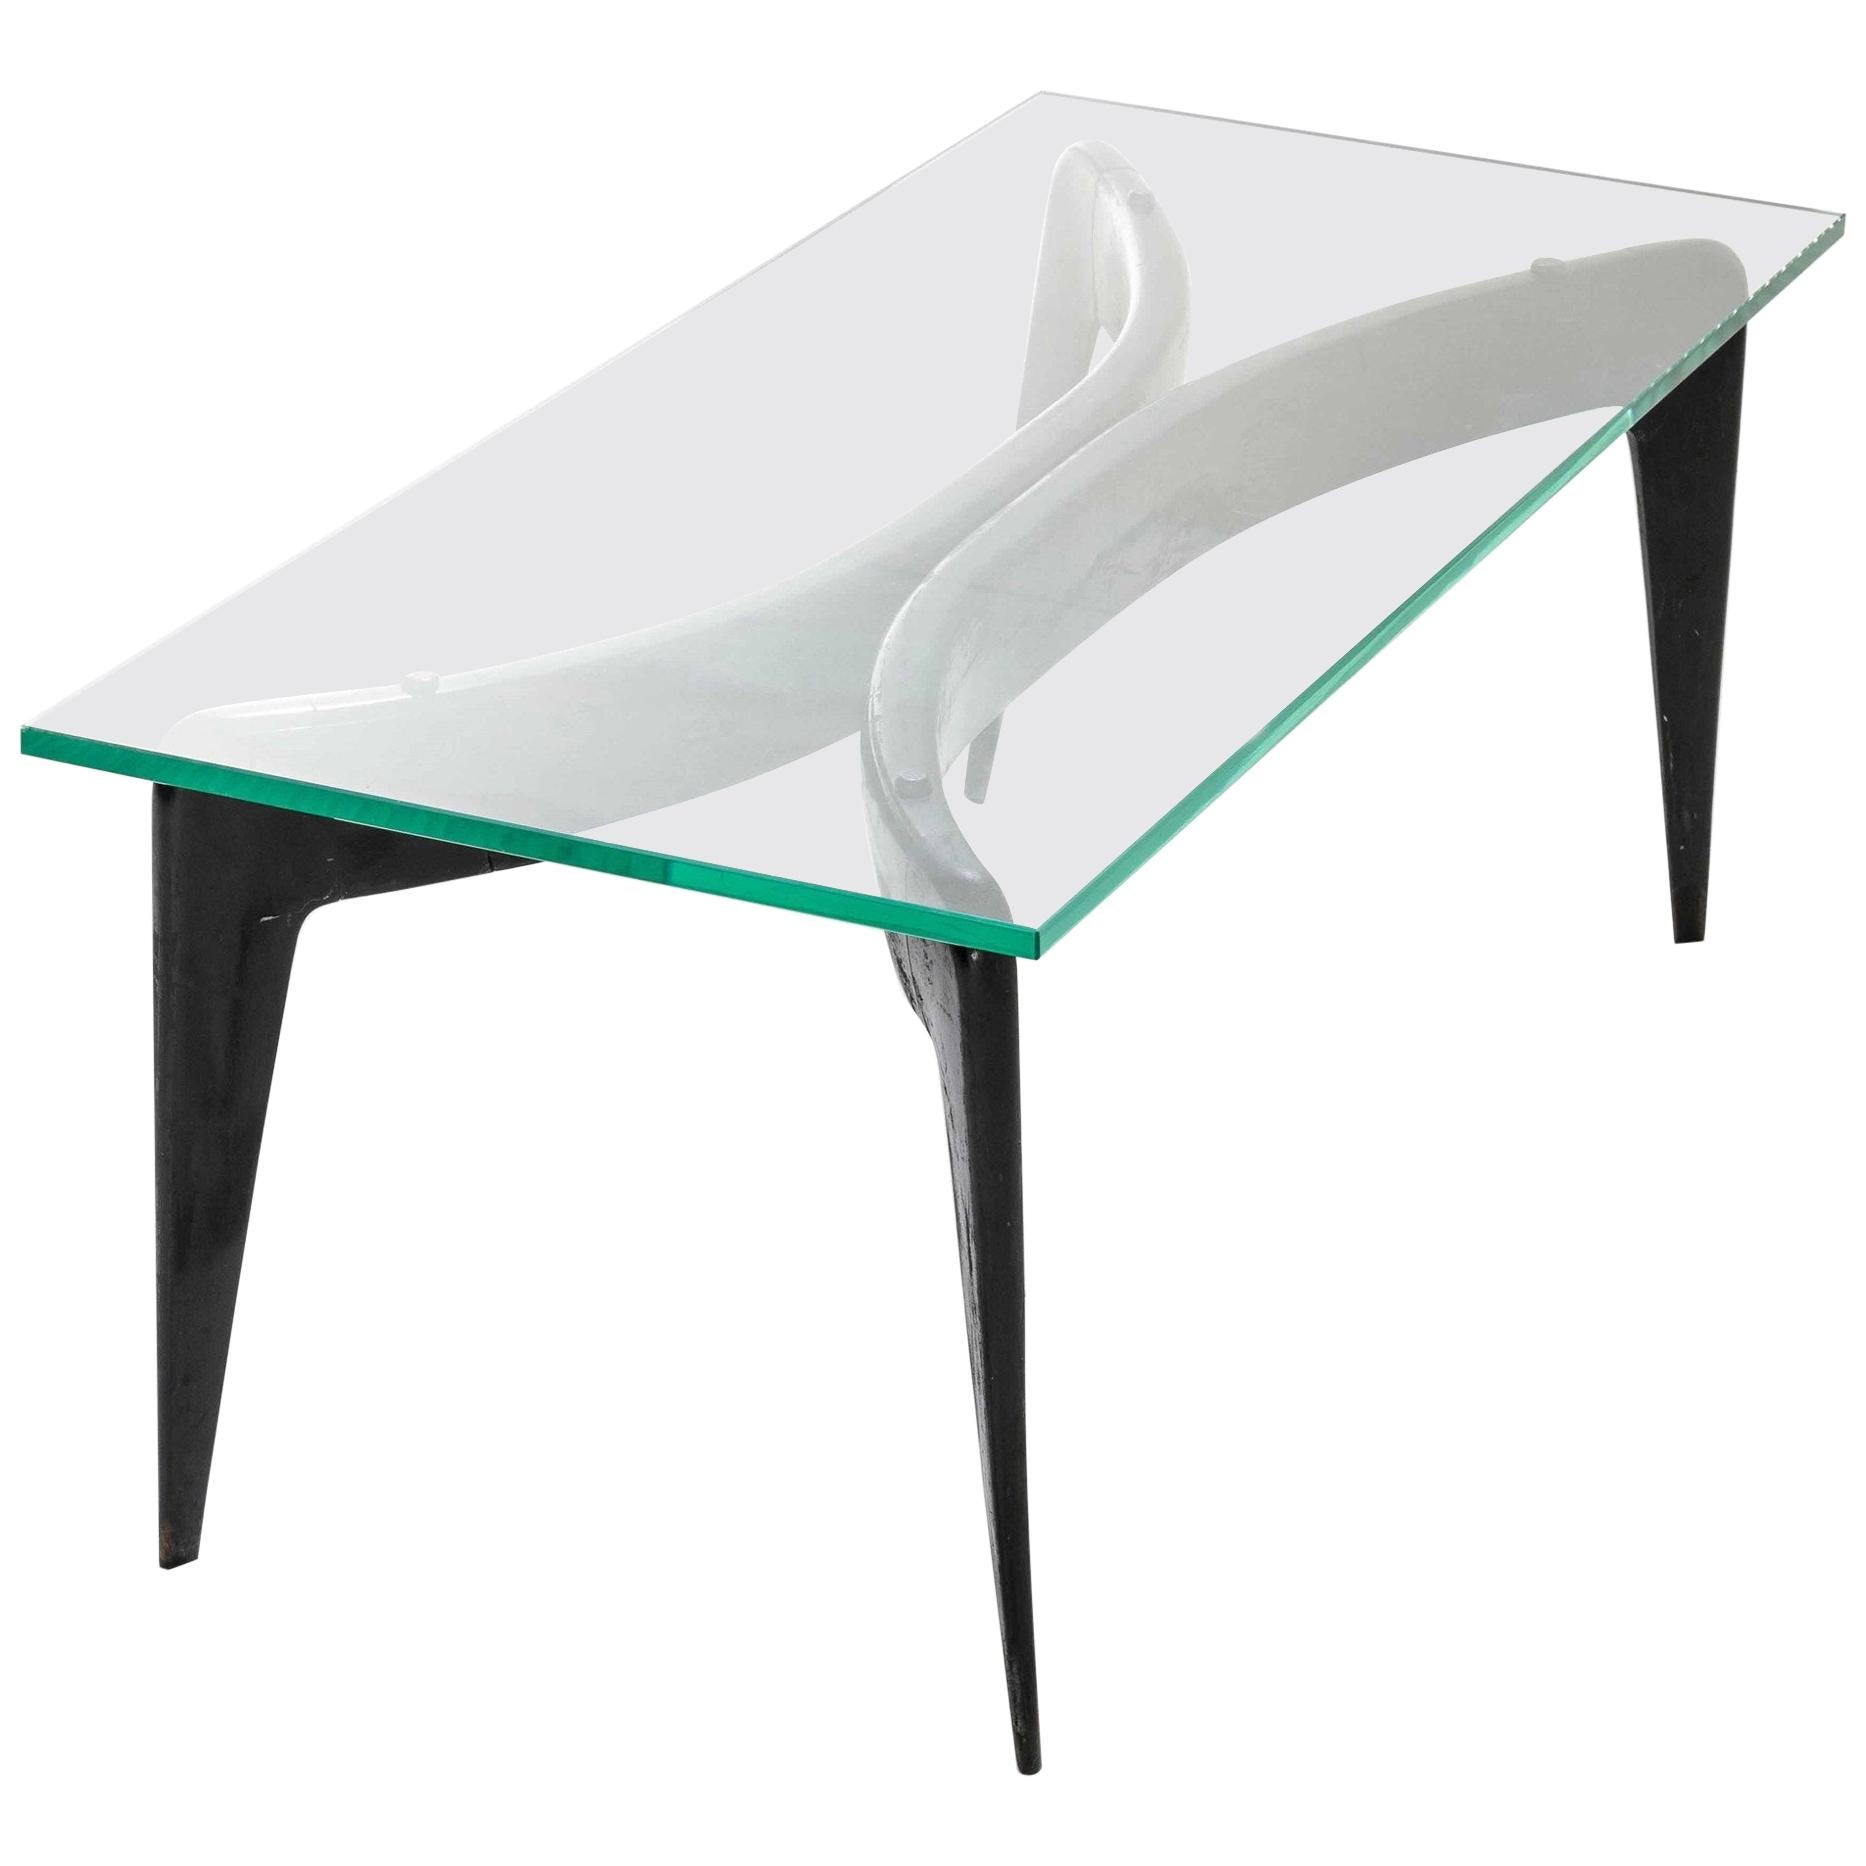 Gio Ponti Sofa Table in Wood and Glass Fontana Arte, 1950s, Italy